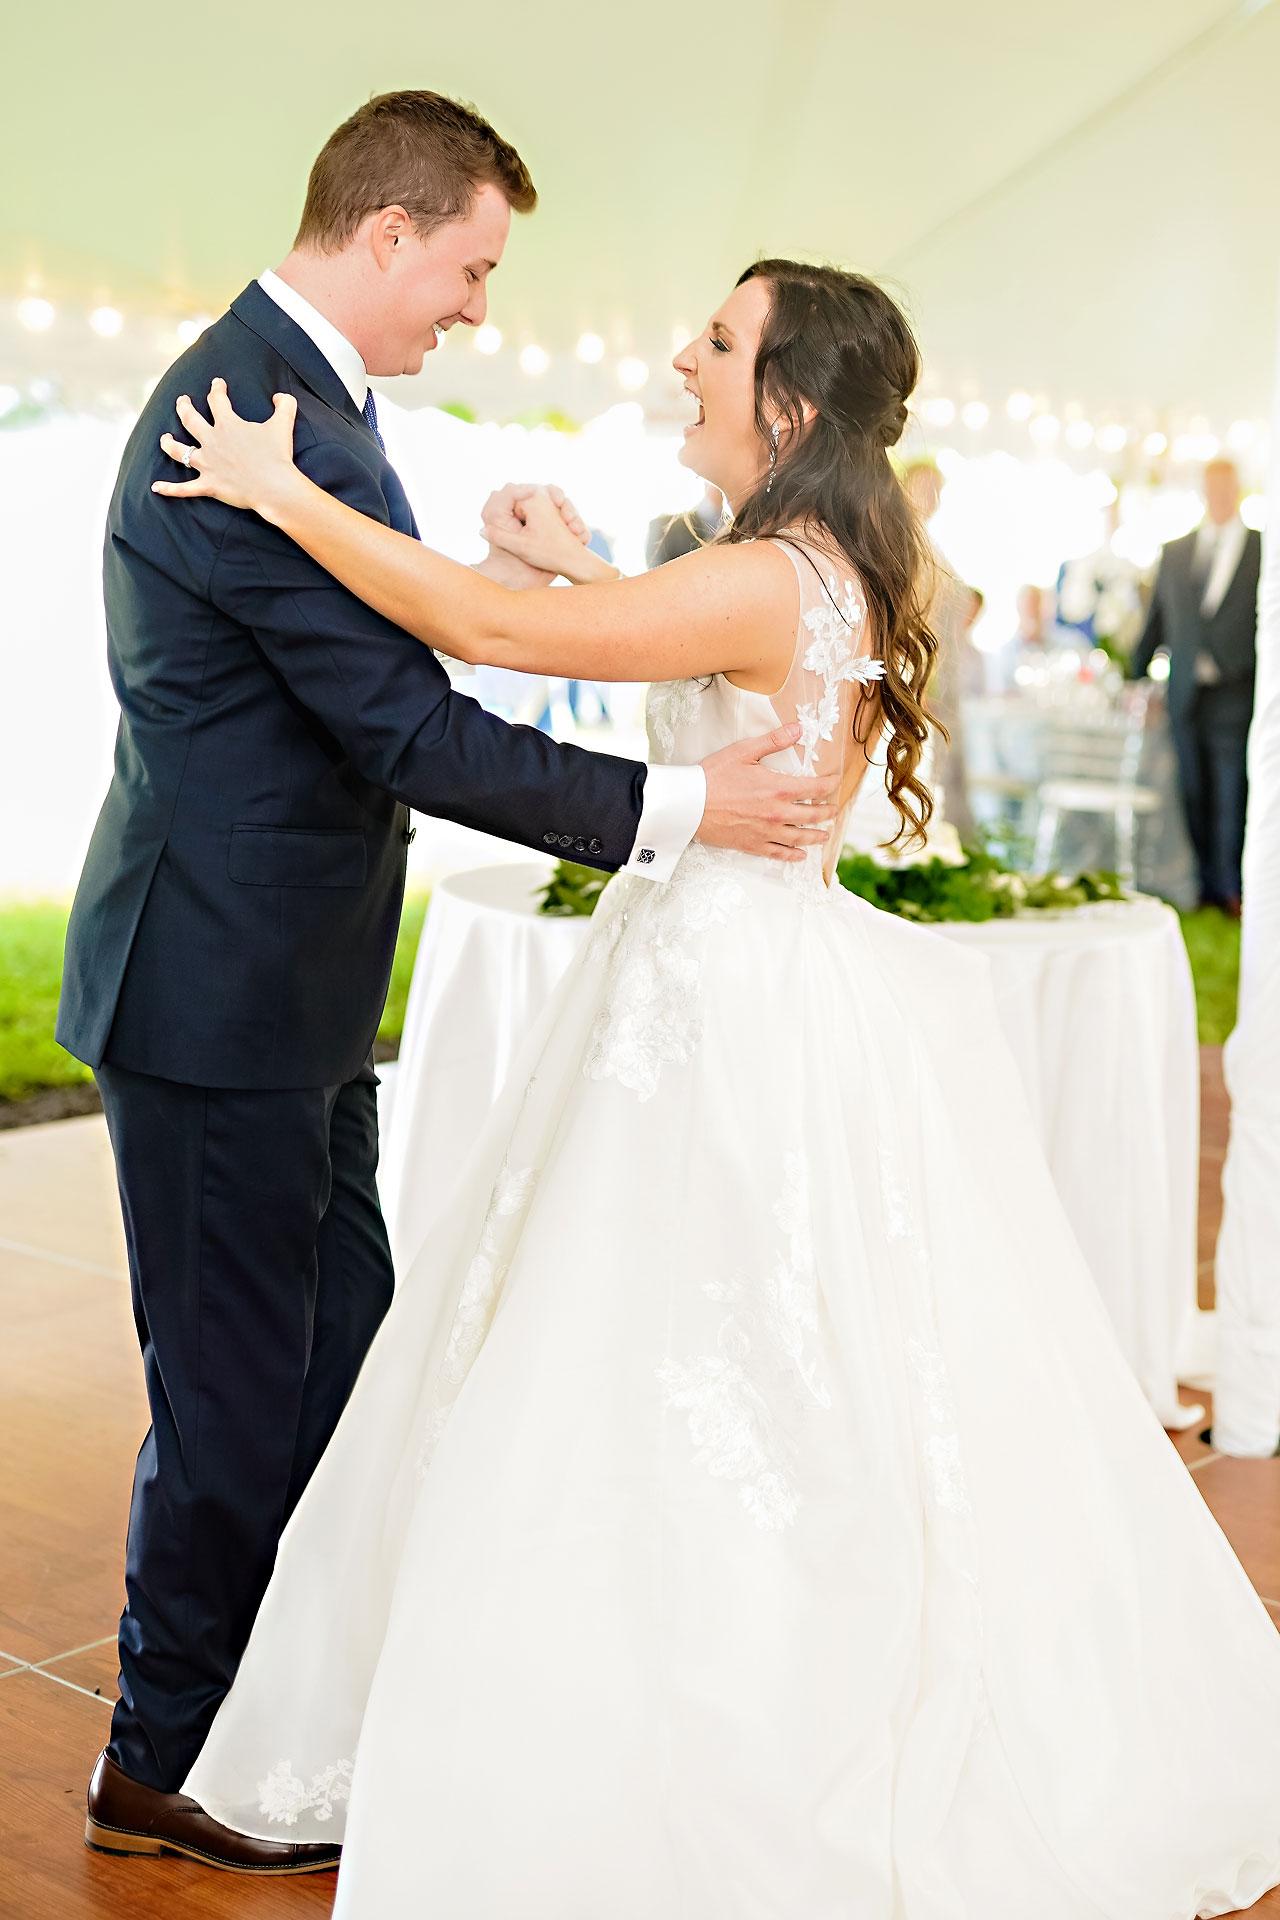 MacKinze John Lafayette Indiana Purdue Wedding 270